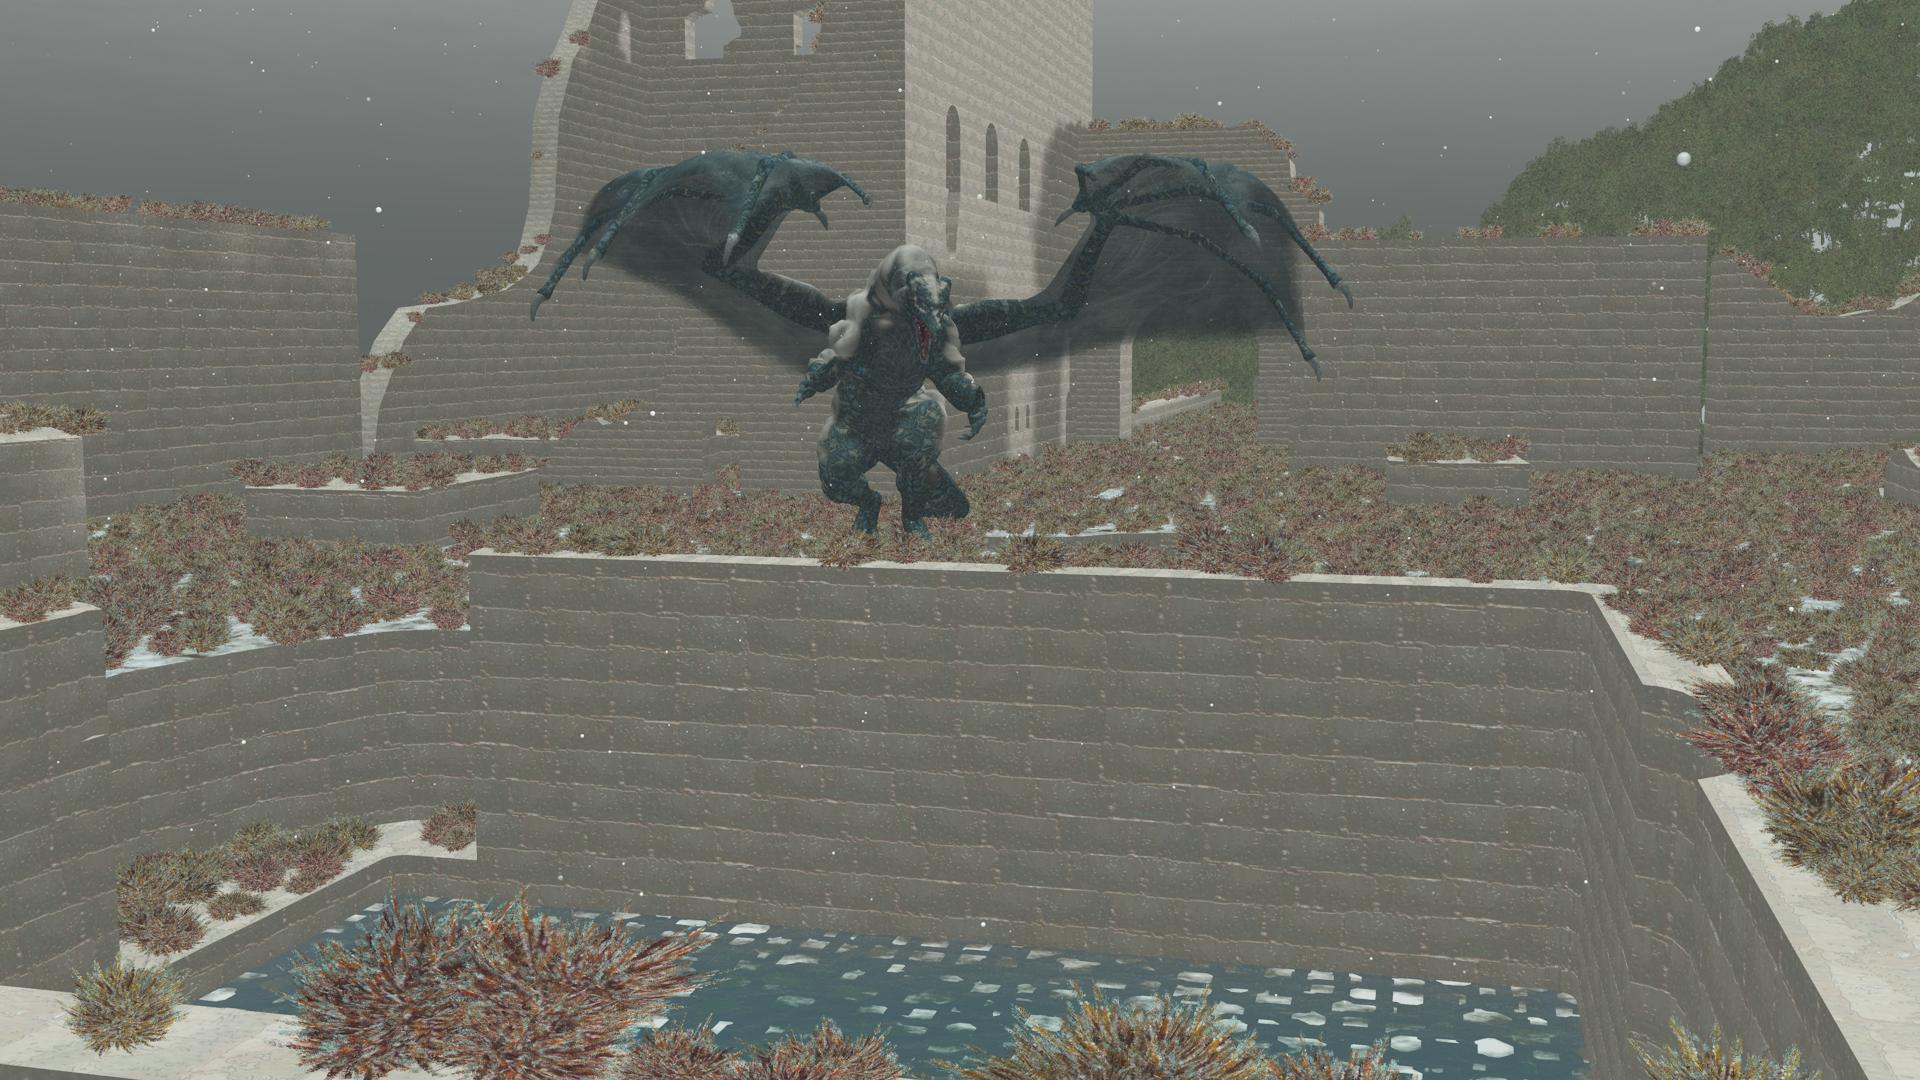 dragon_killmore_2.png